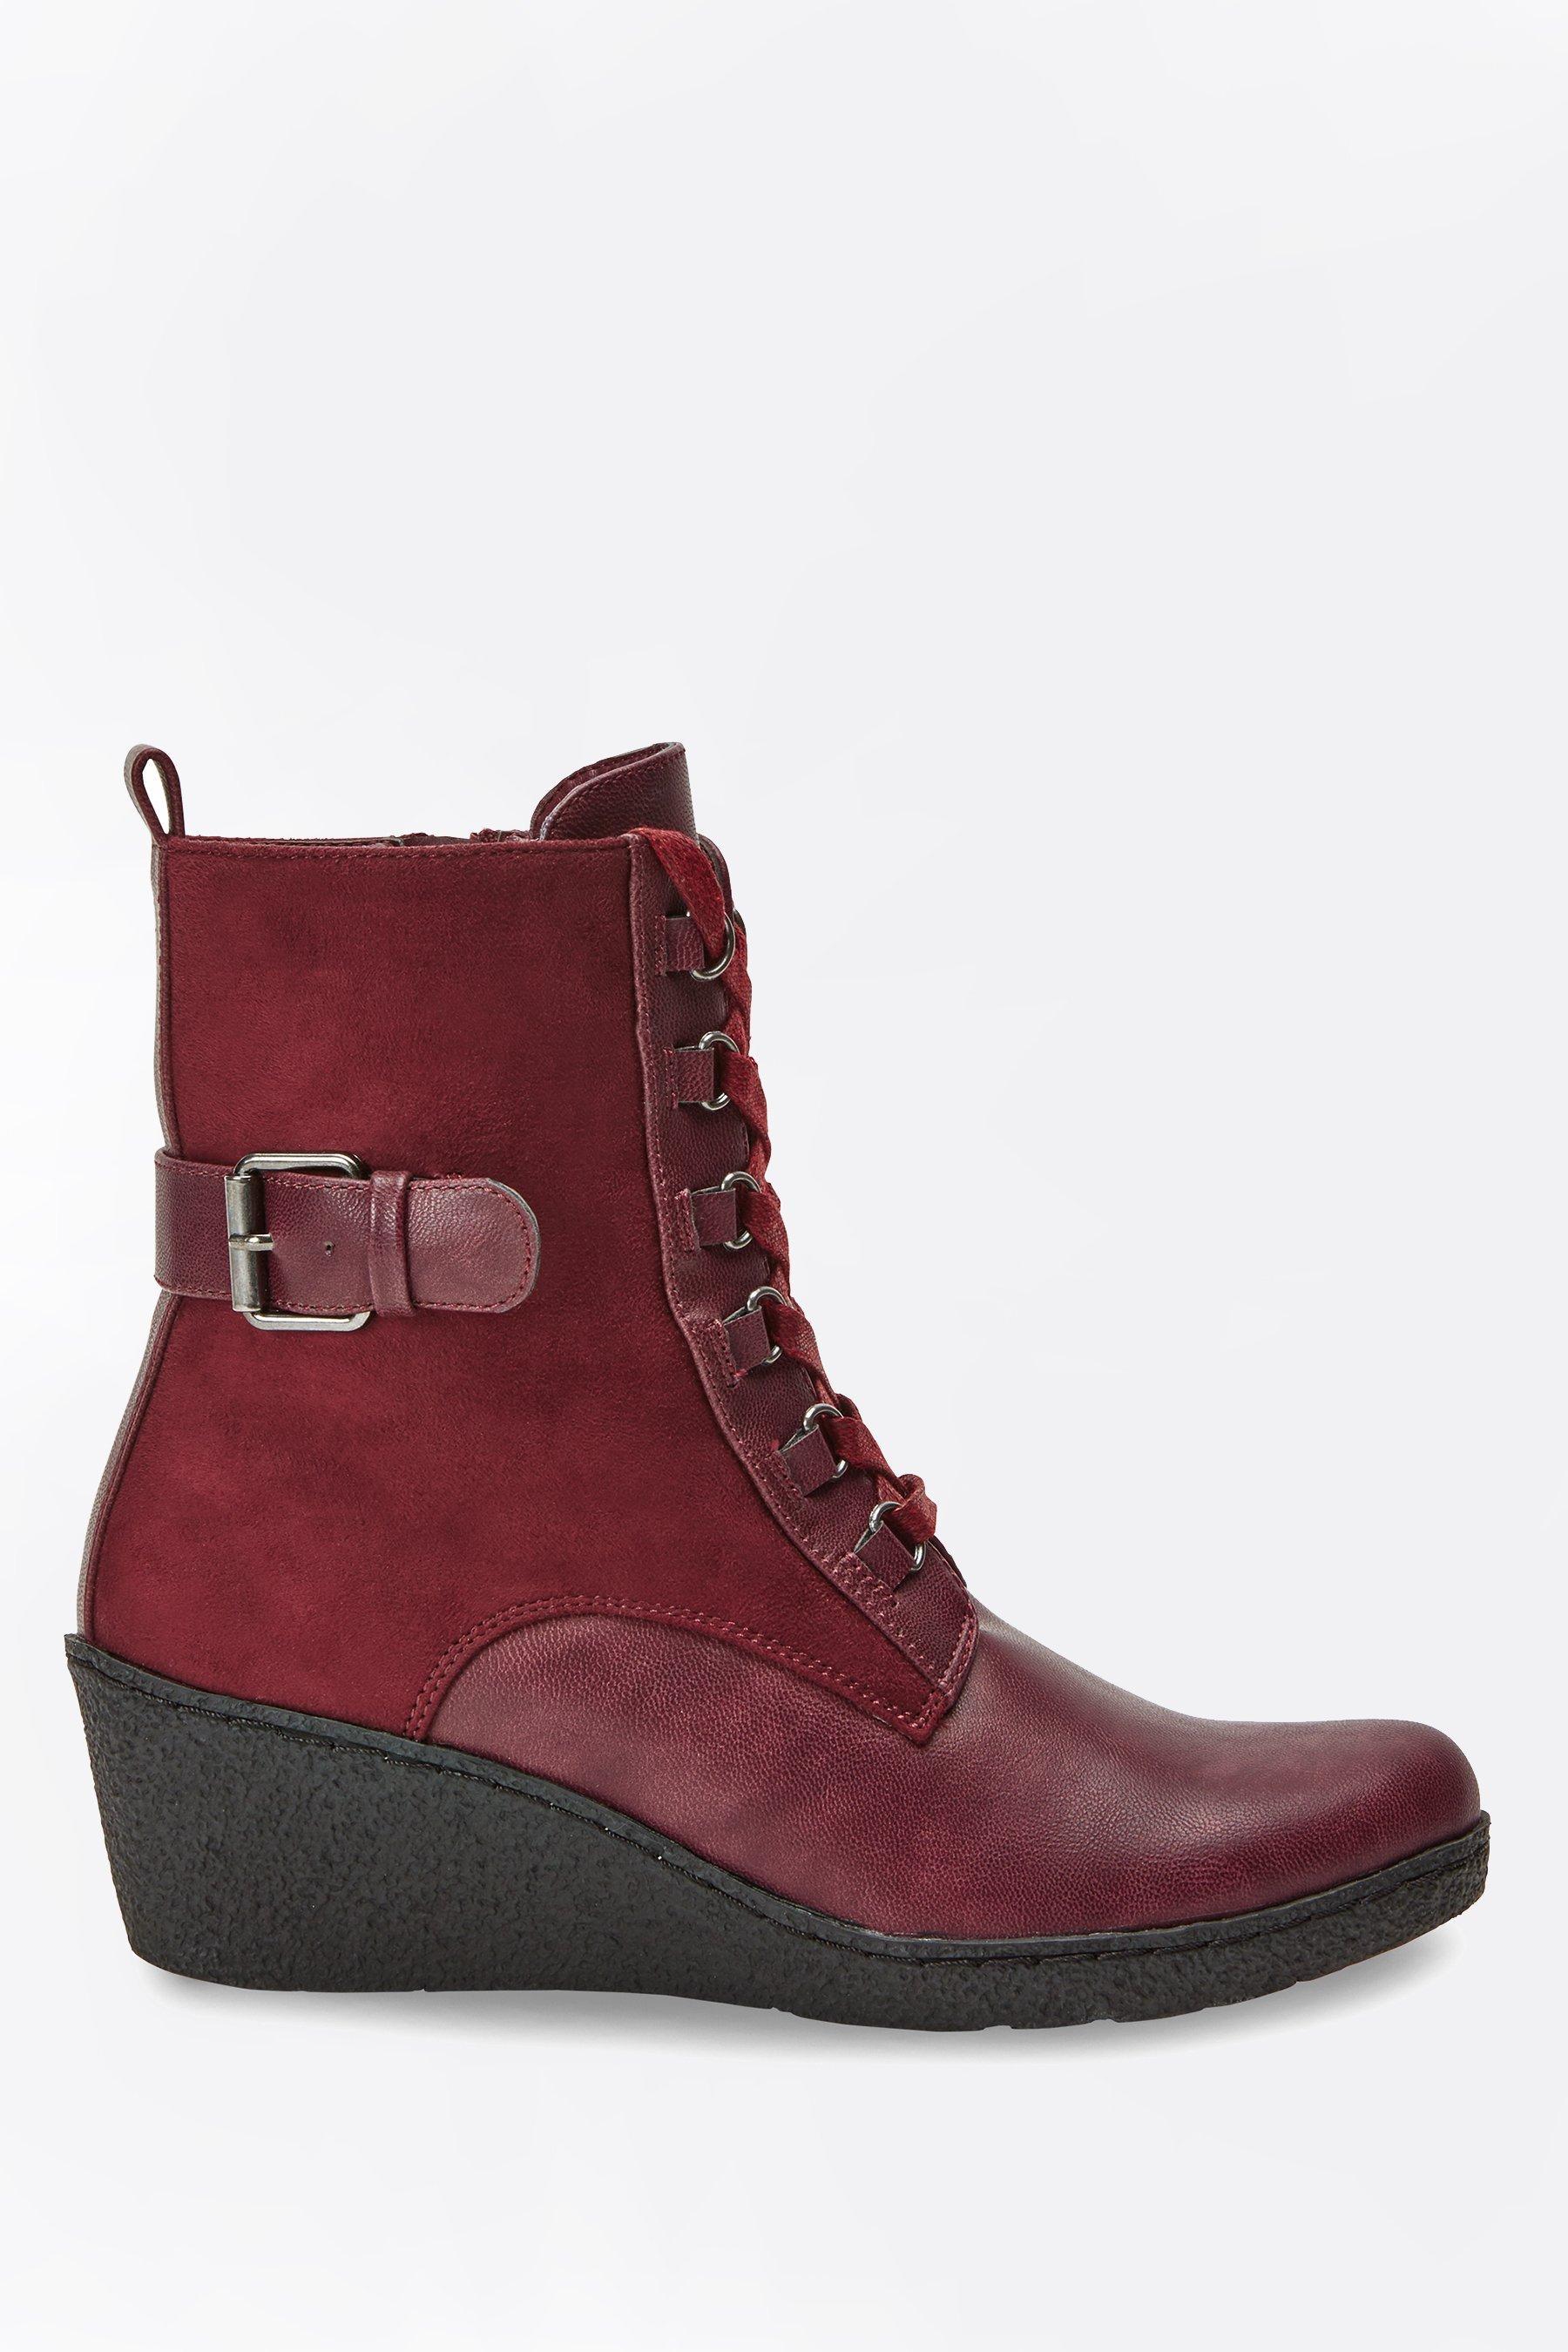 joe browns wedge boots